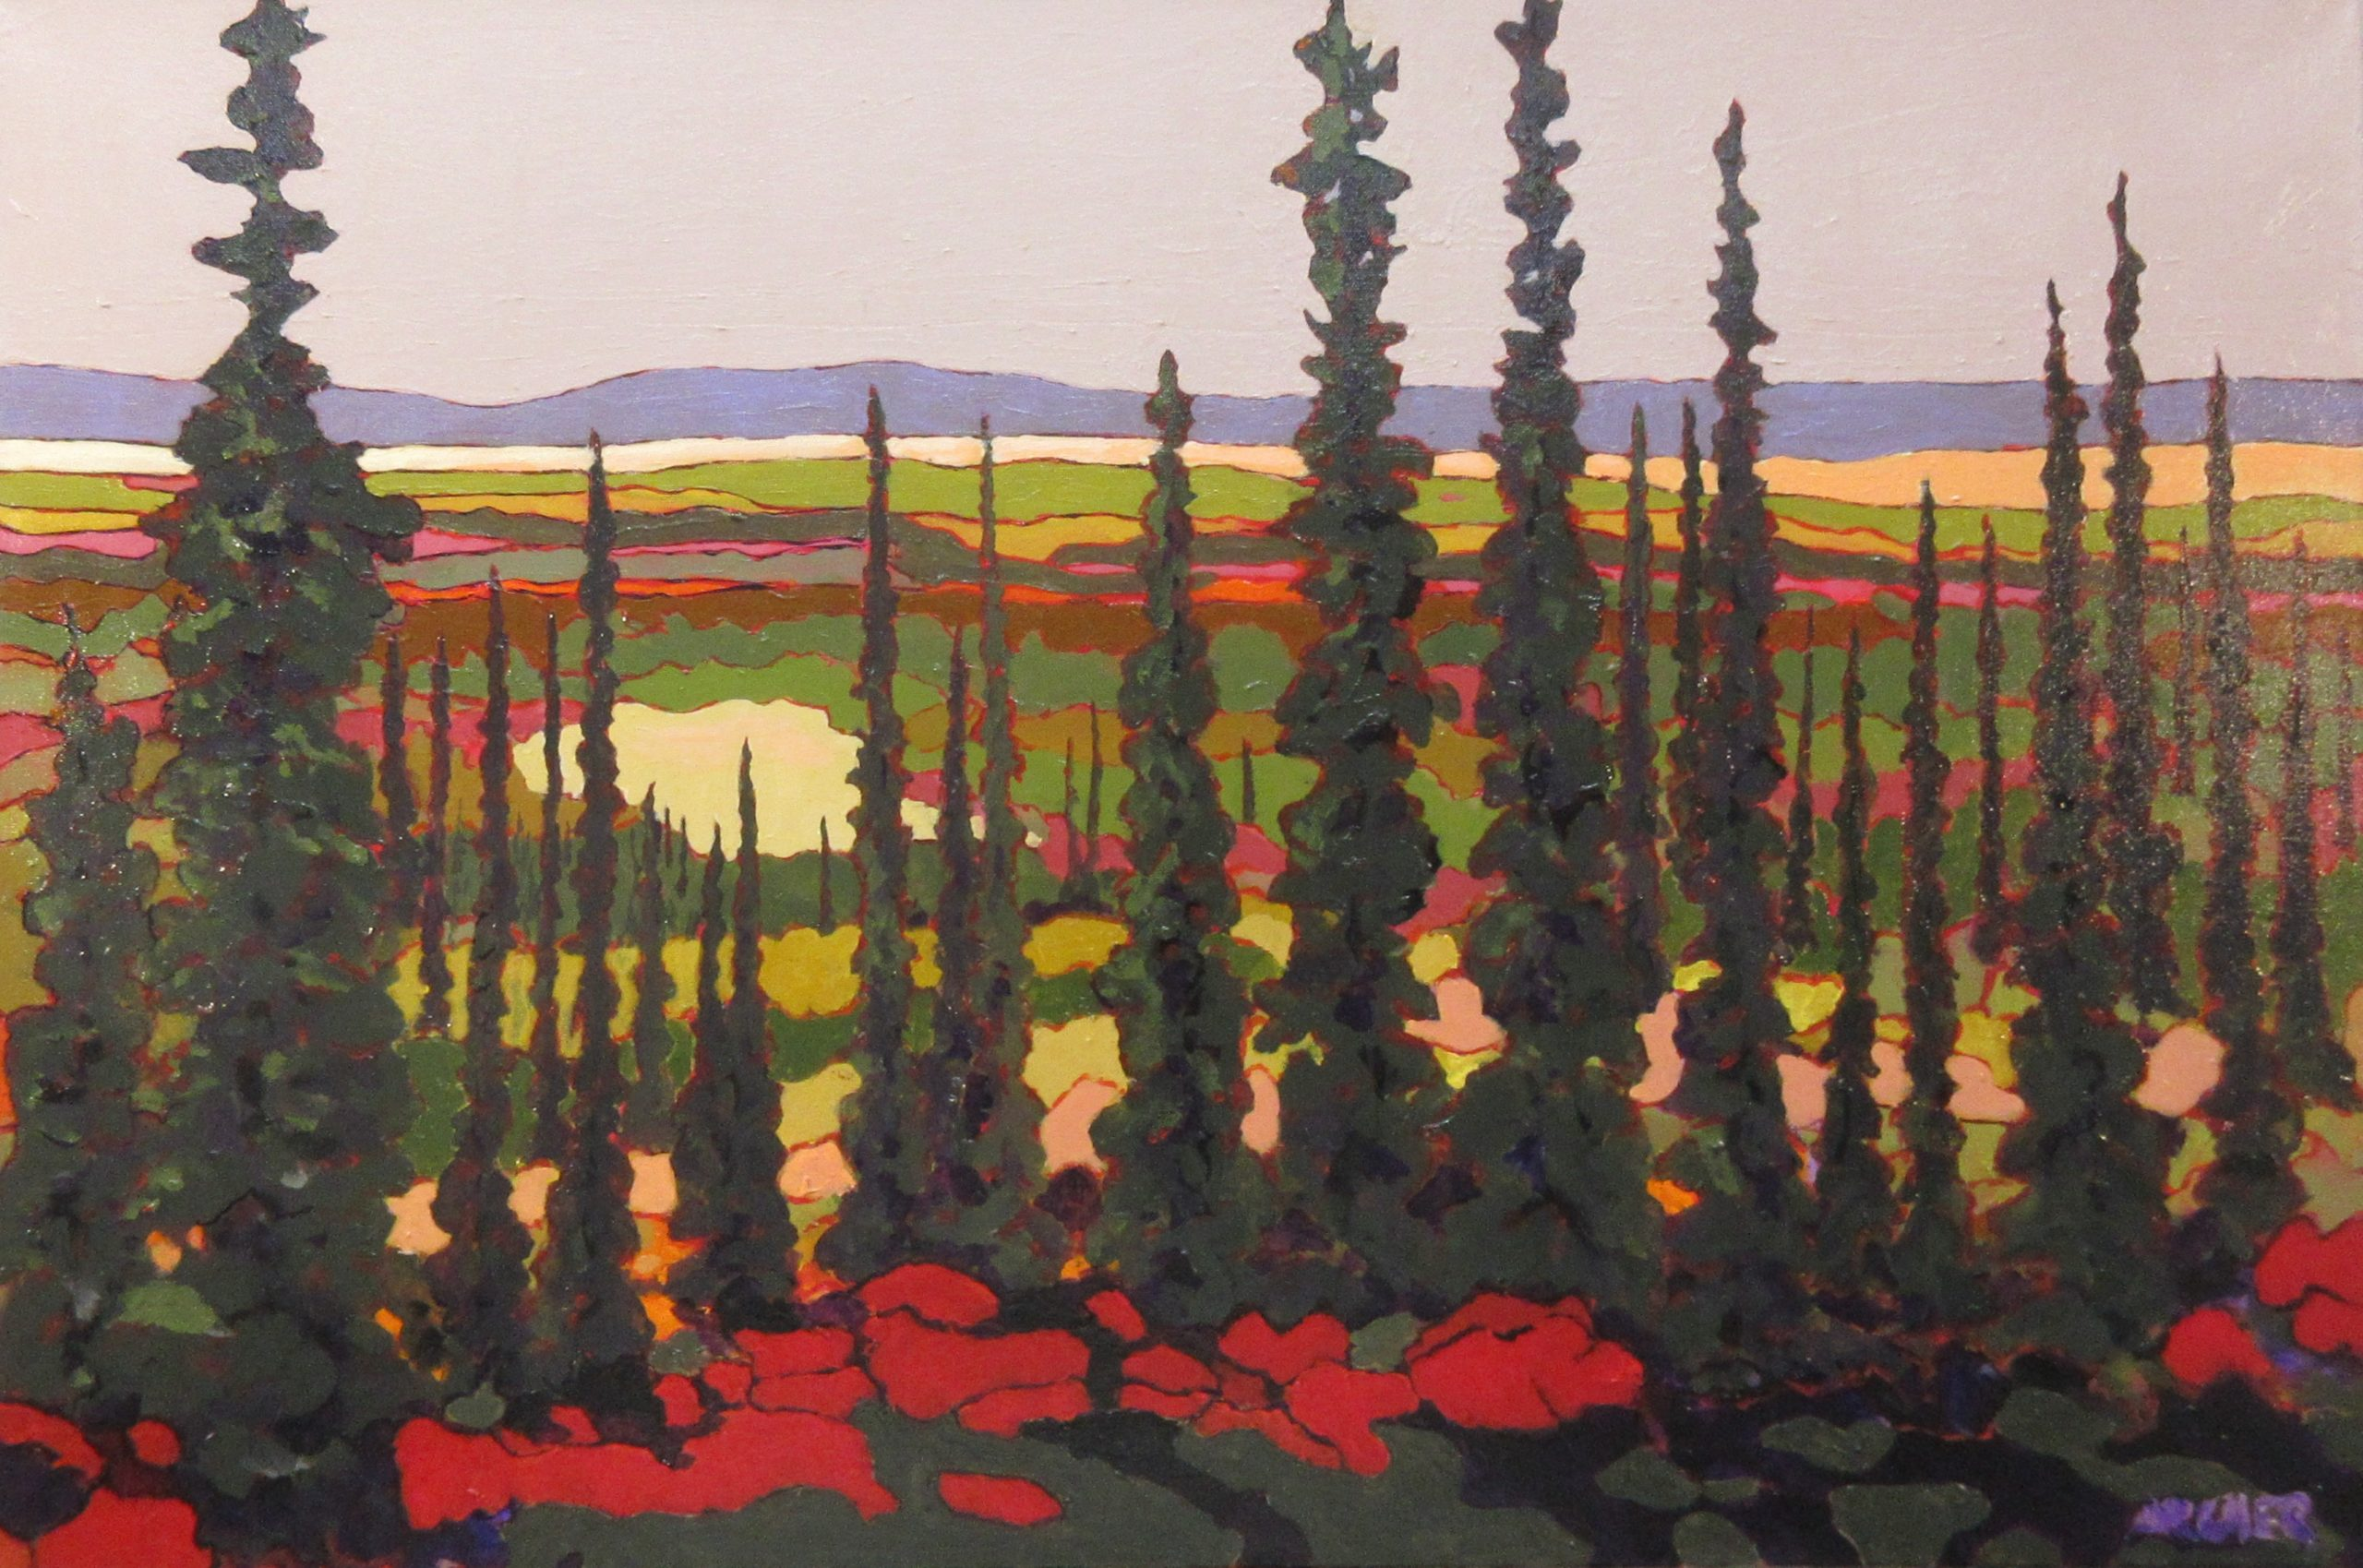 Northern Views No. 5 by John Archer